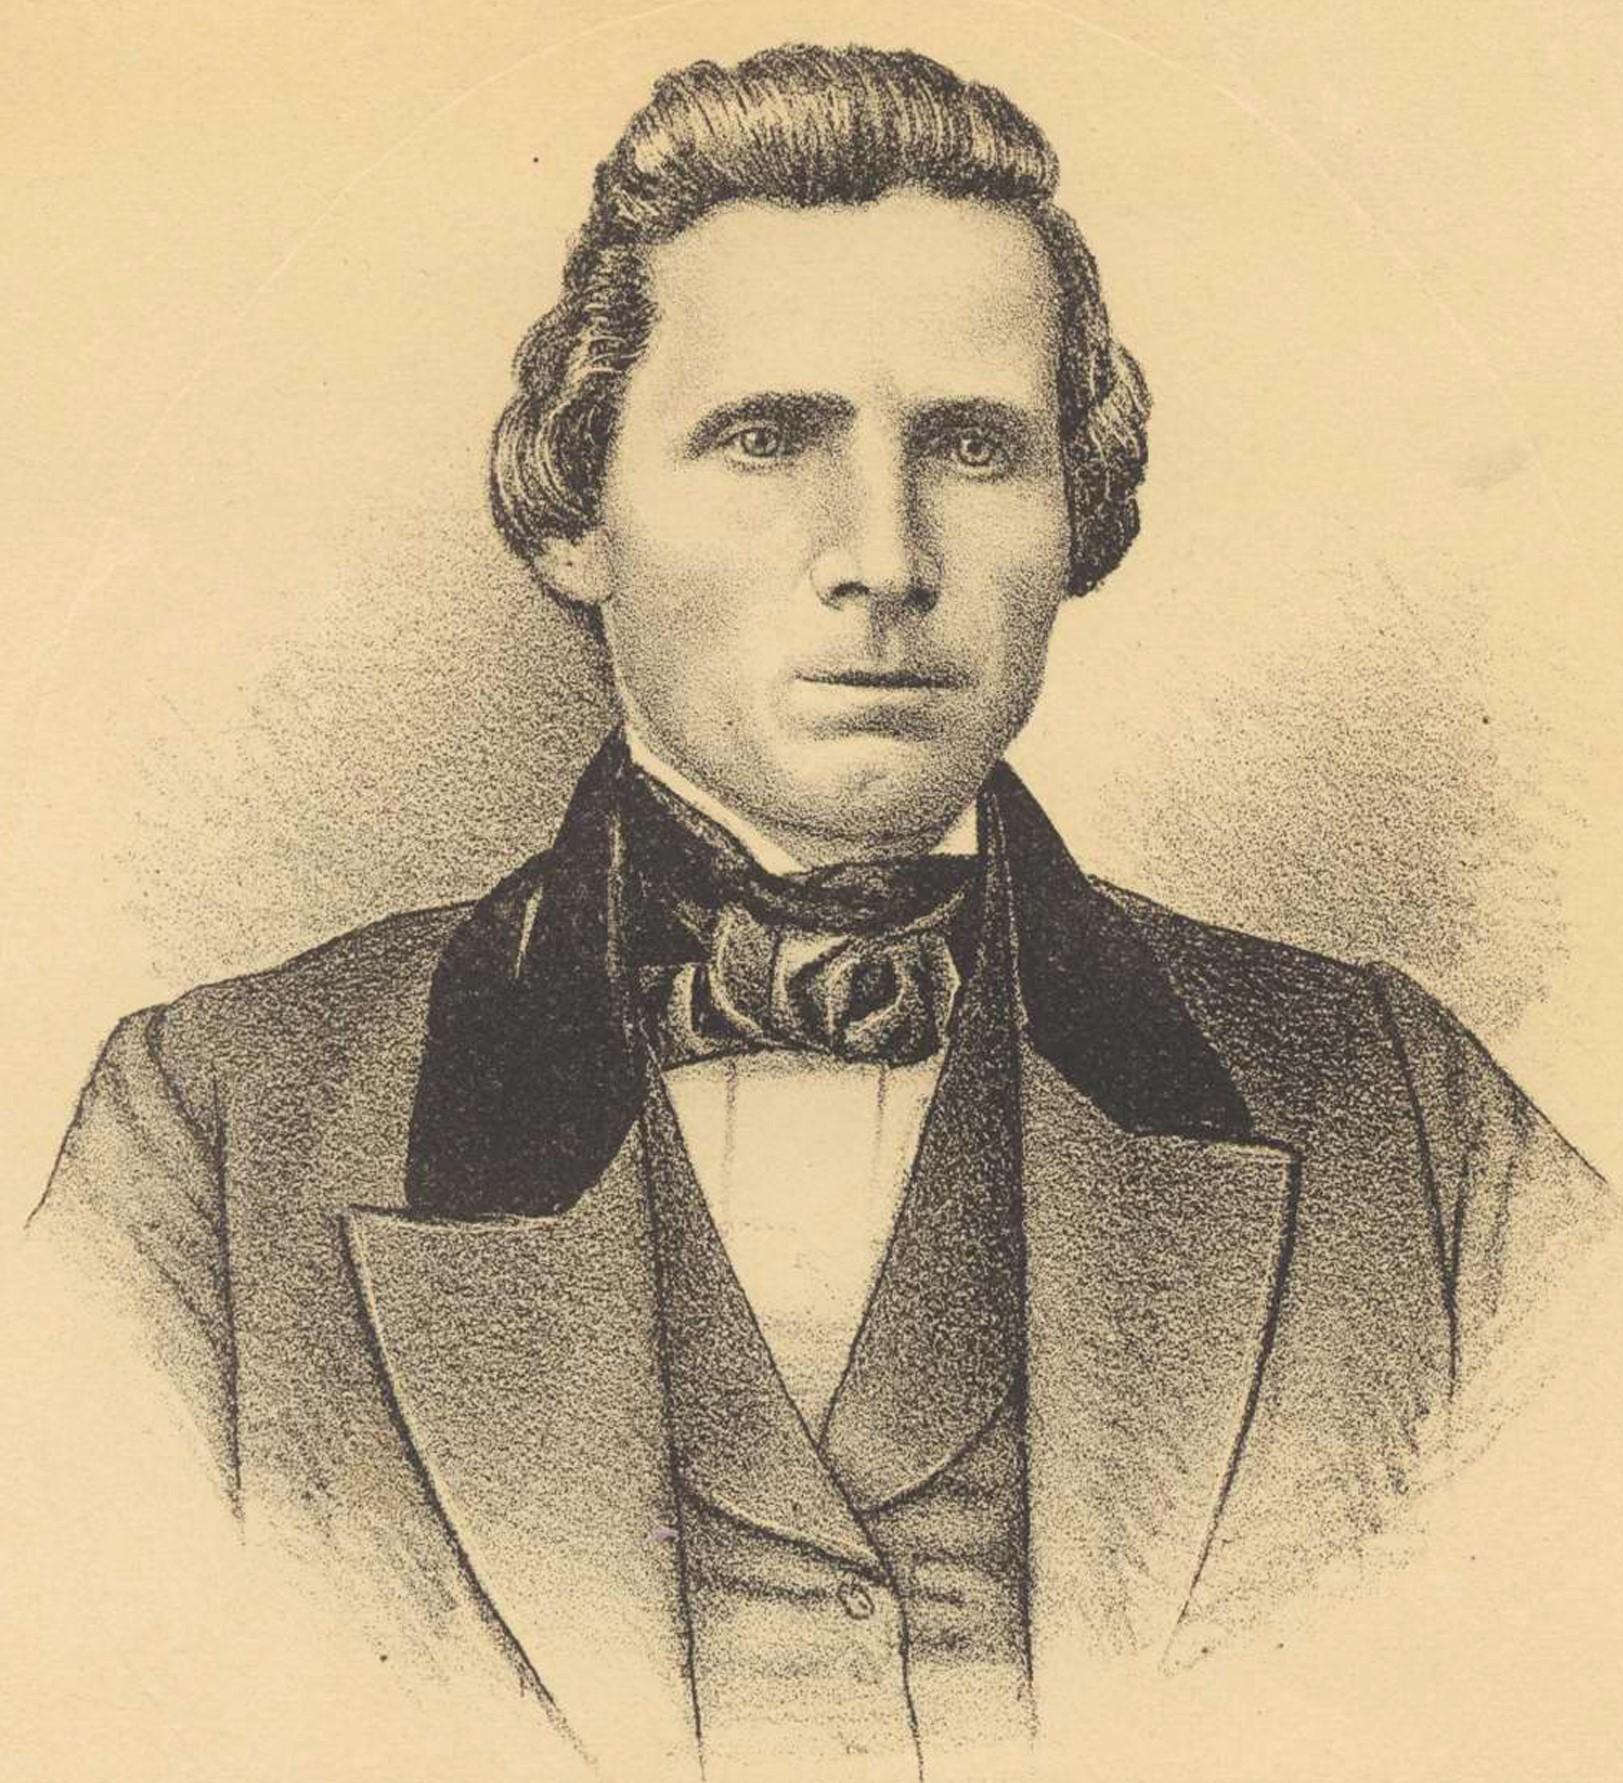 Harmon Heald from 1877 Atlas Edited.jpg